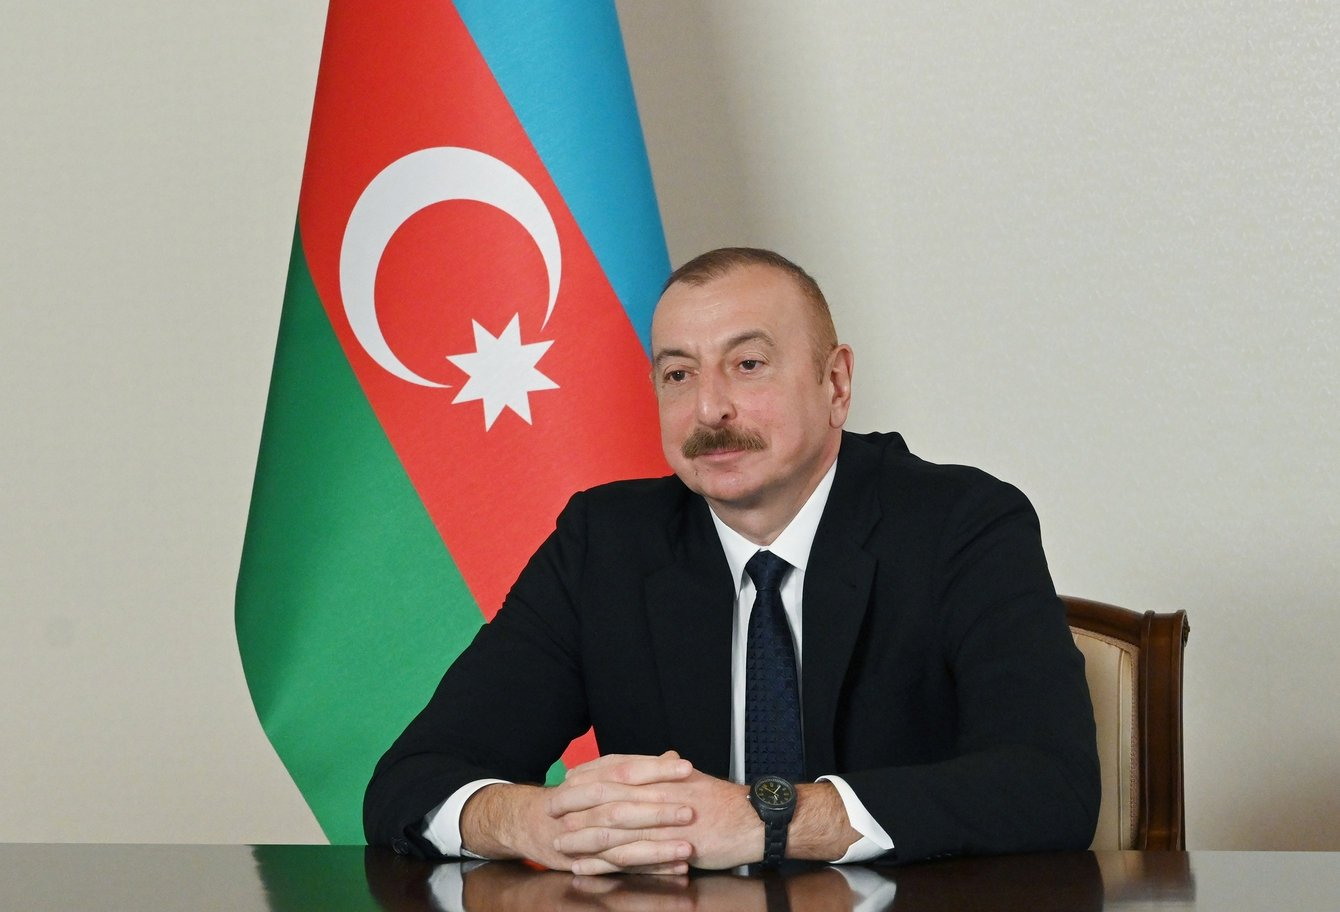 Azerbaijani President Ilham Aliyev attends a videoconference in the capital Baku, Azerbaijan, Jan. 27, 2021. (Azerbaijani Presidency via AA)